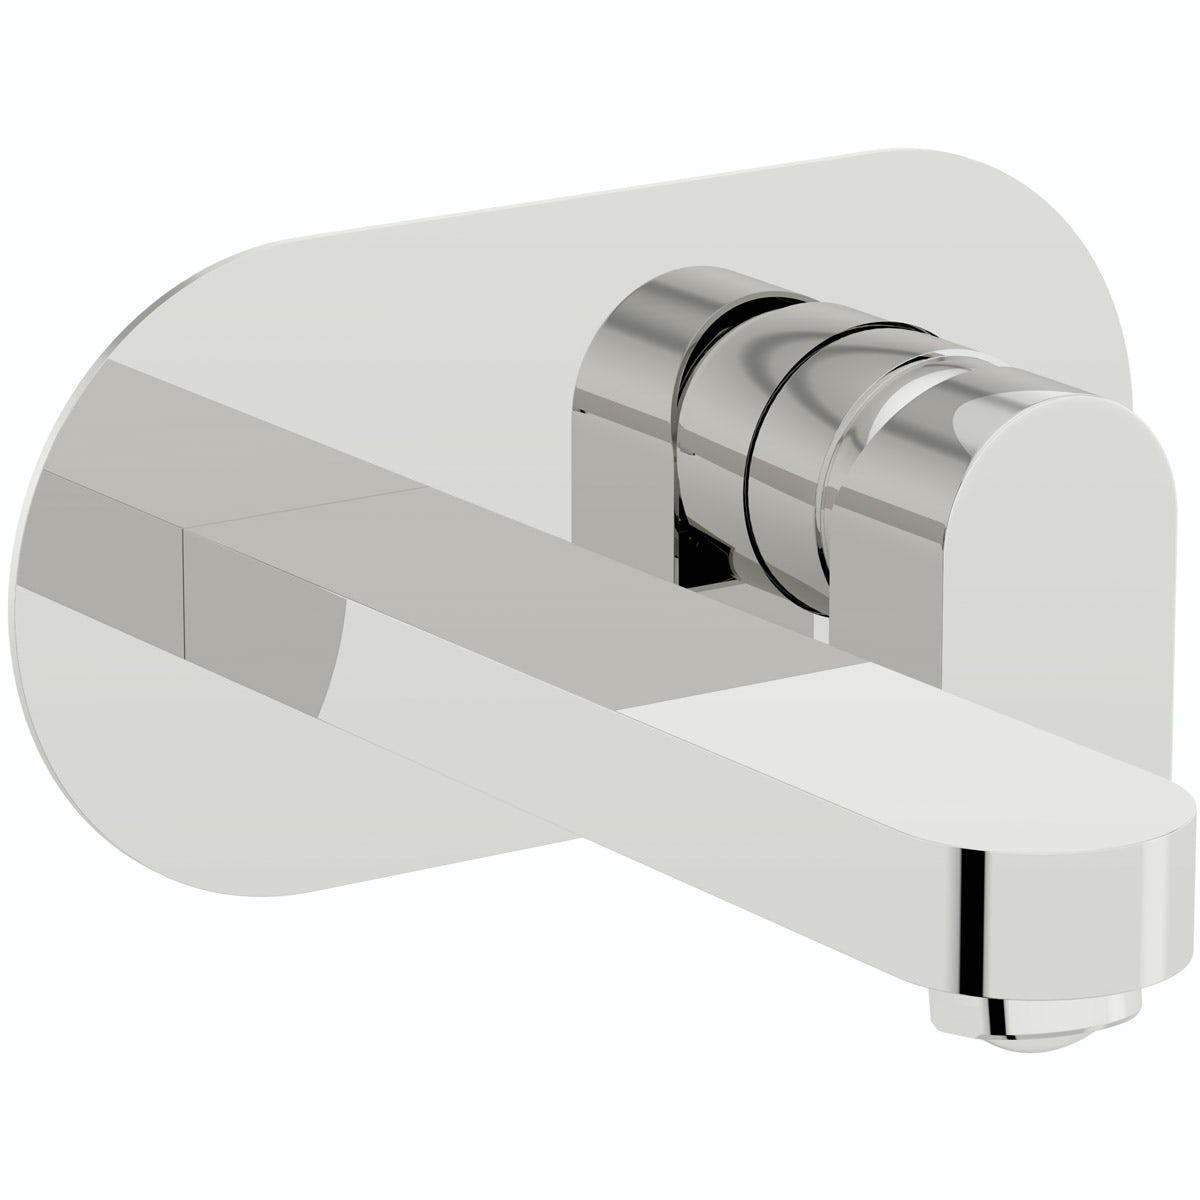 Mode Hardy wall mounted bath mixer tap